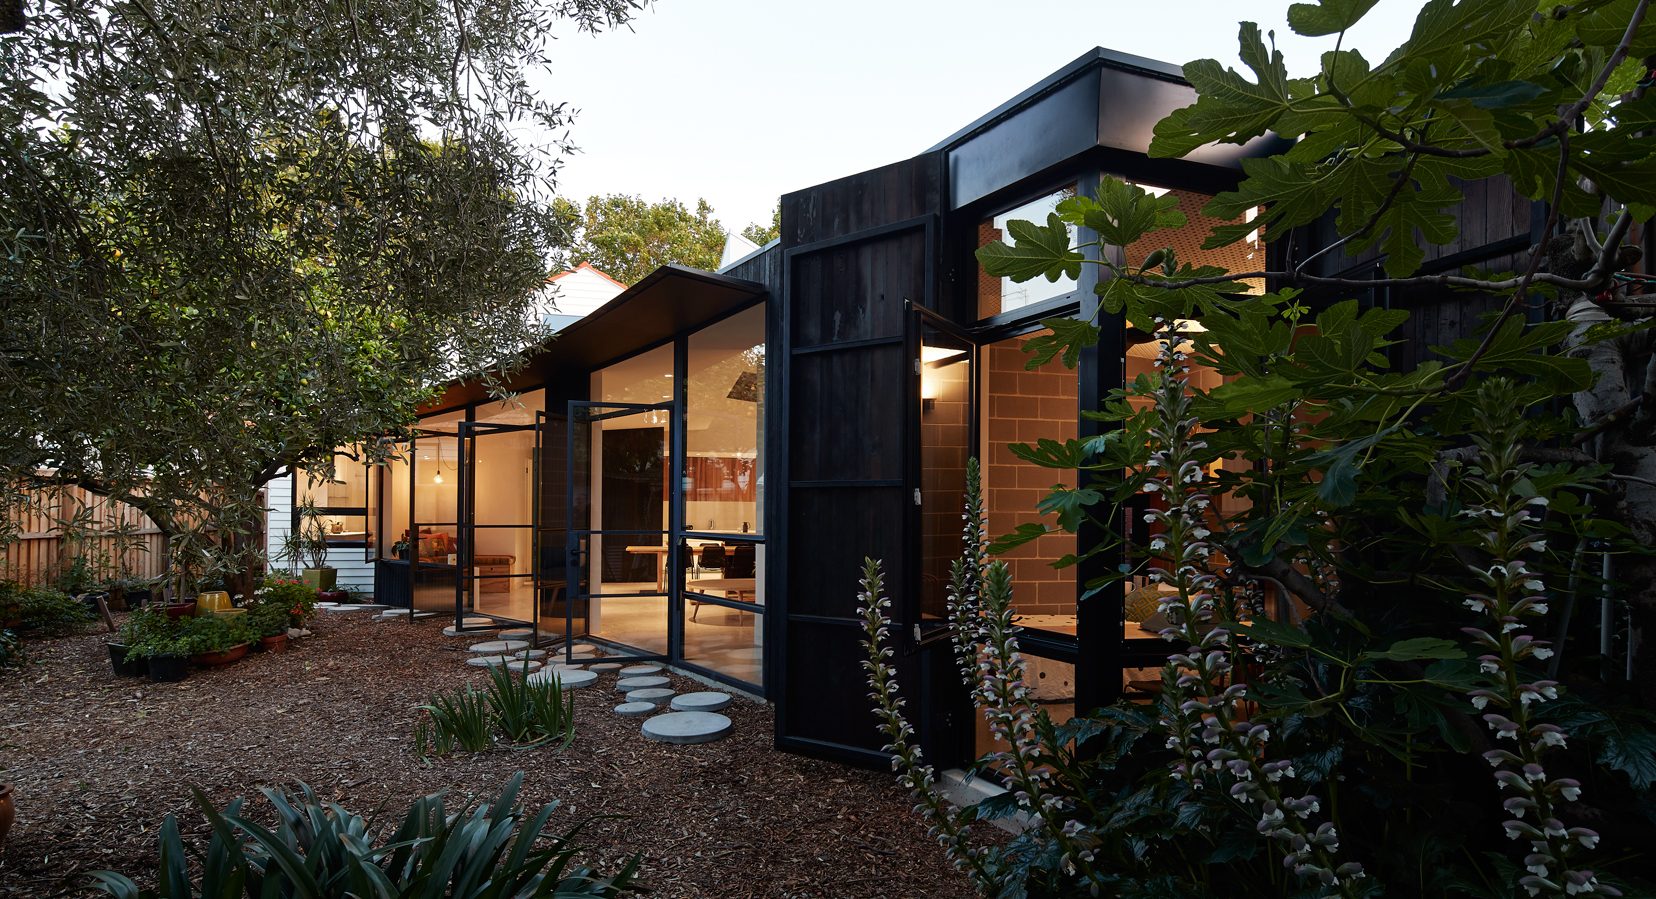 Garden pavilion by black line one x architecture studio opumo - Studio ix architecture ...